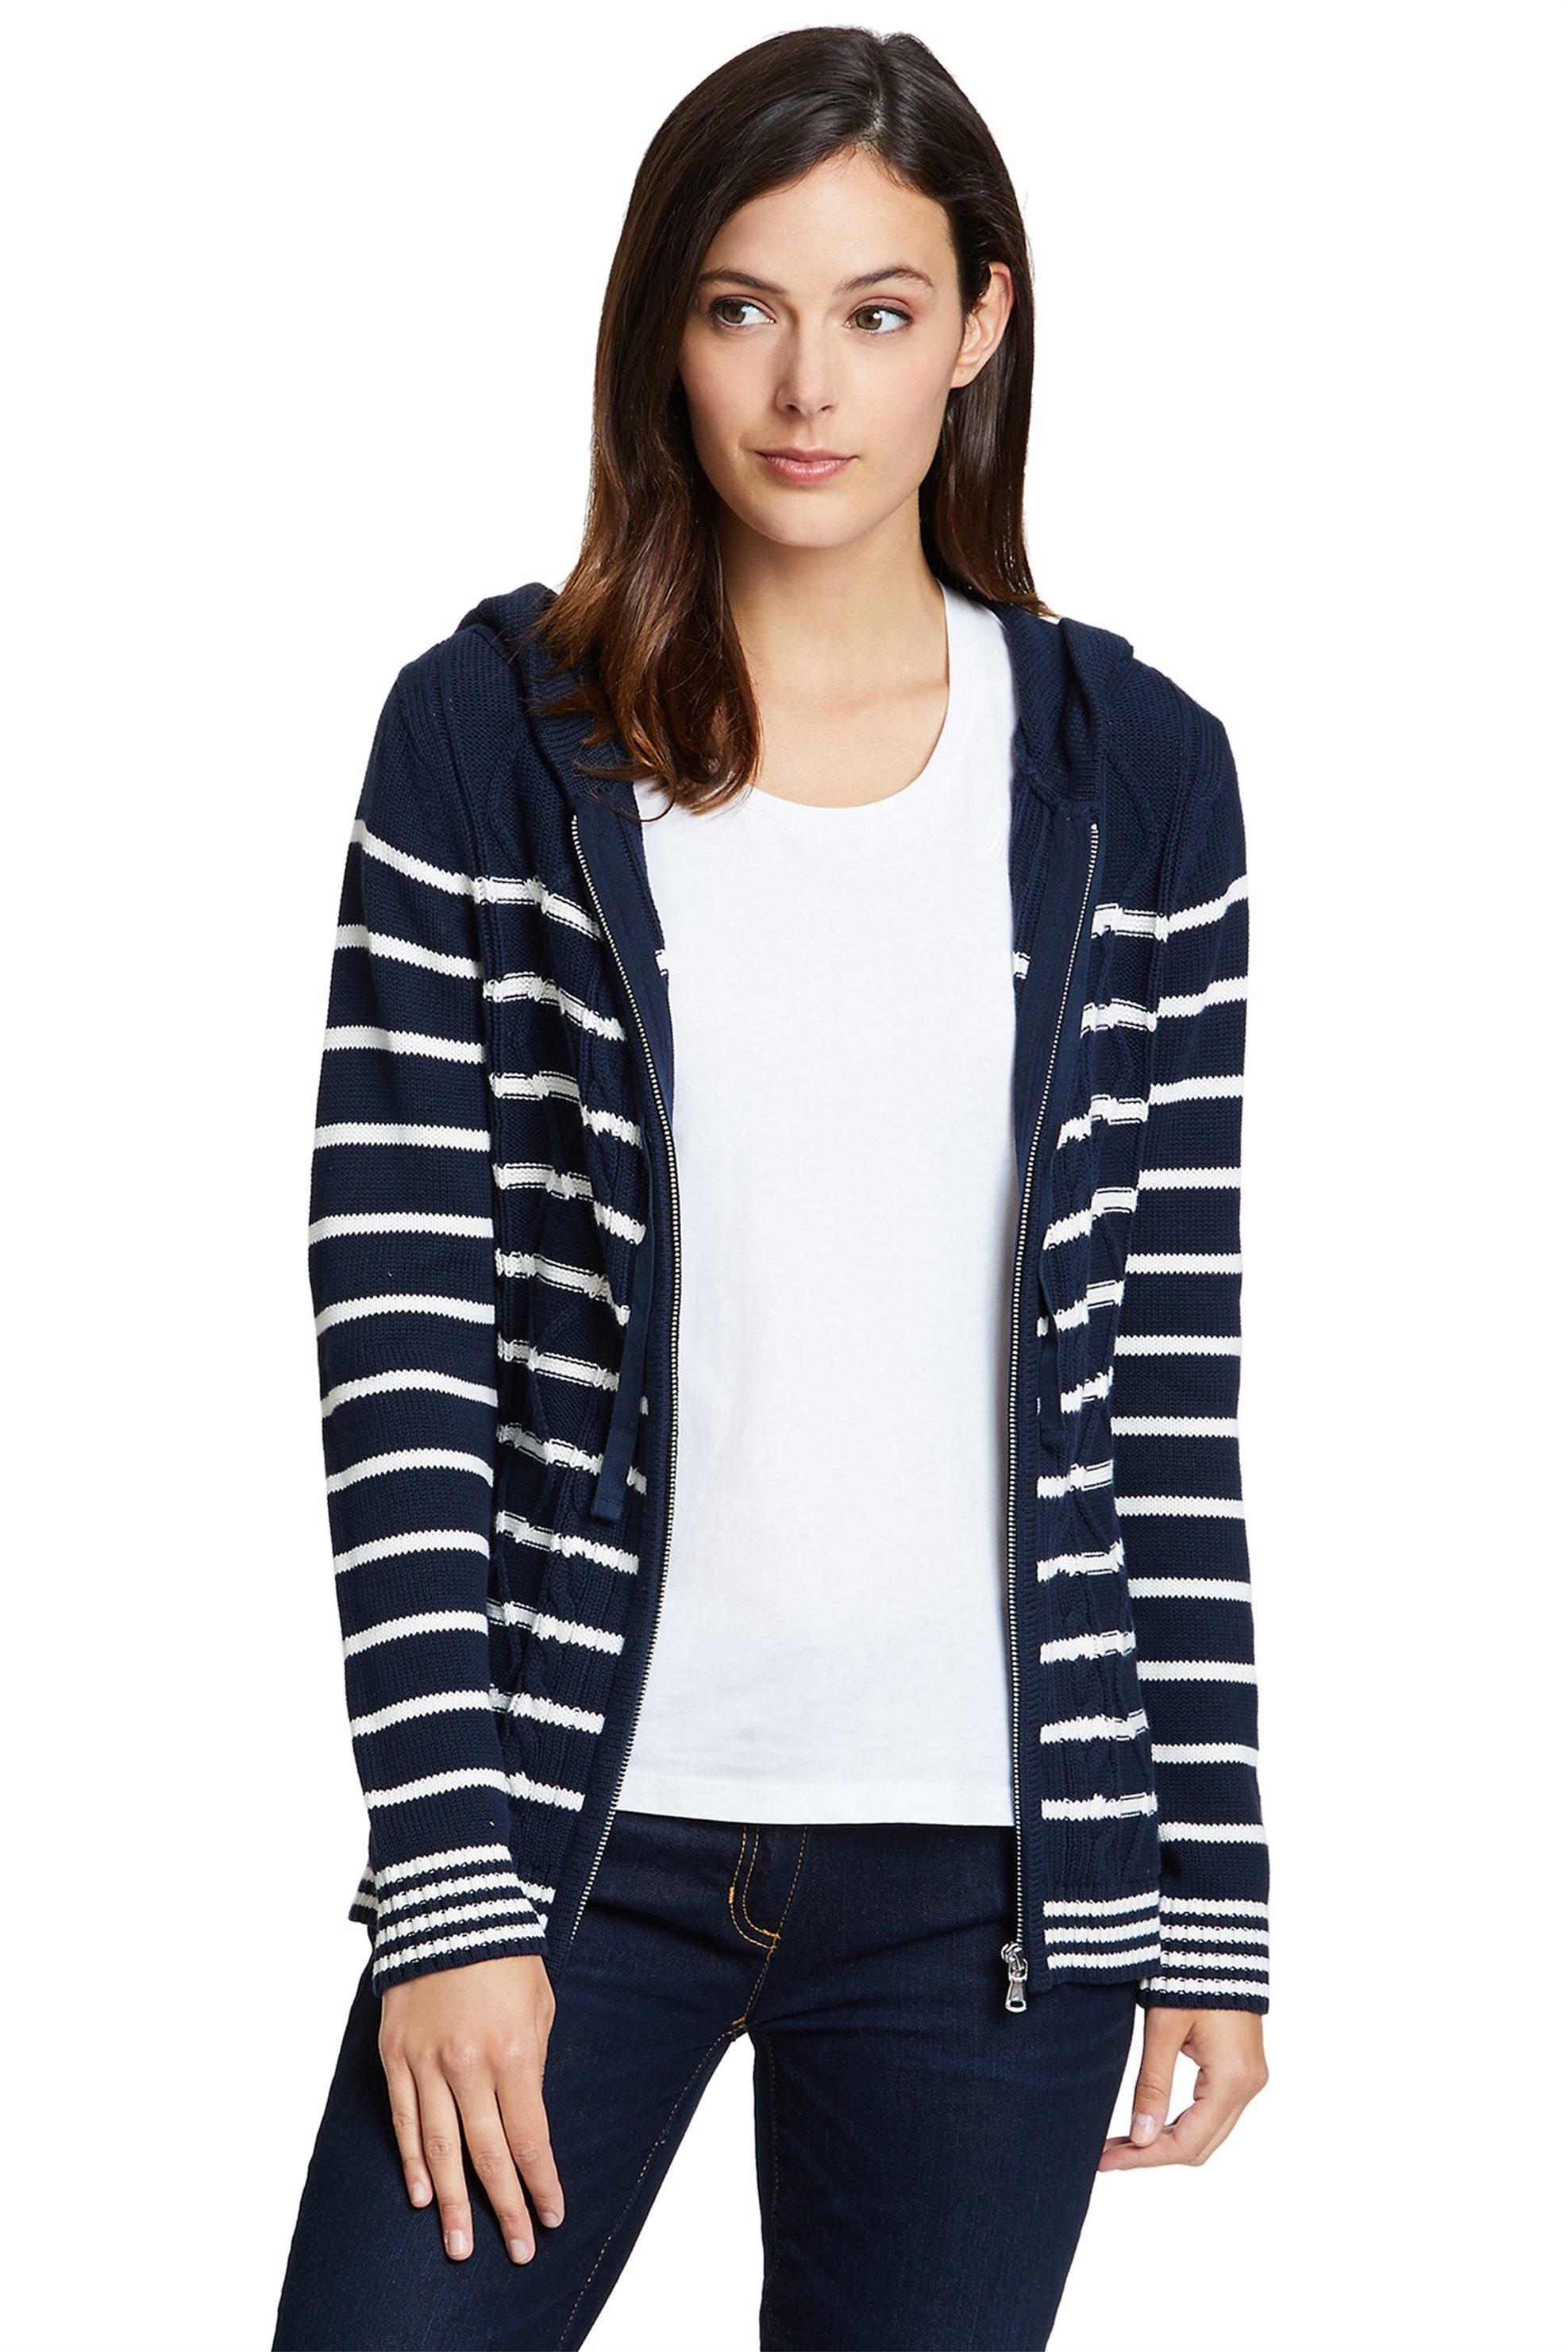 Nautica γυναικεία πλεκτή ριγέ ζακέτα με κουκούλα και φερμουάρ - 83S220 - Μπλε Σκ γυναικα   ρουχα   πλεκτά   ζακέτες